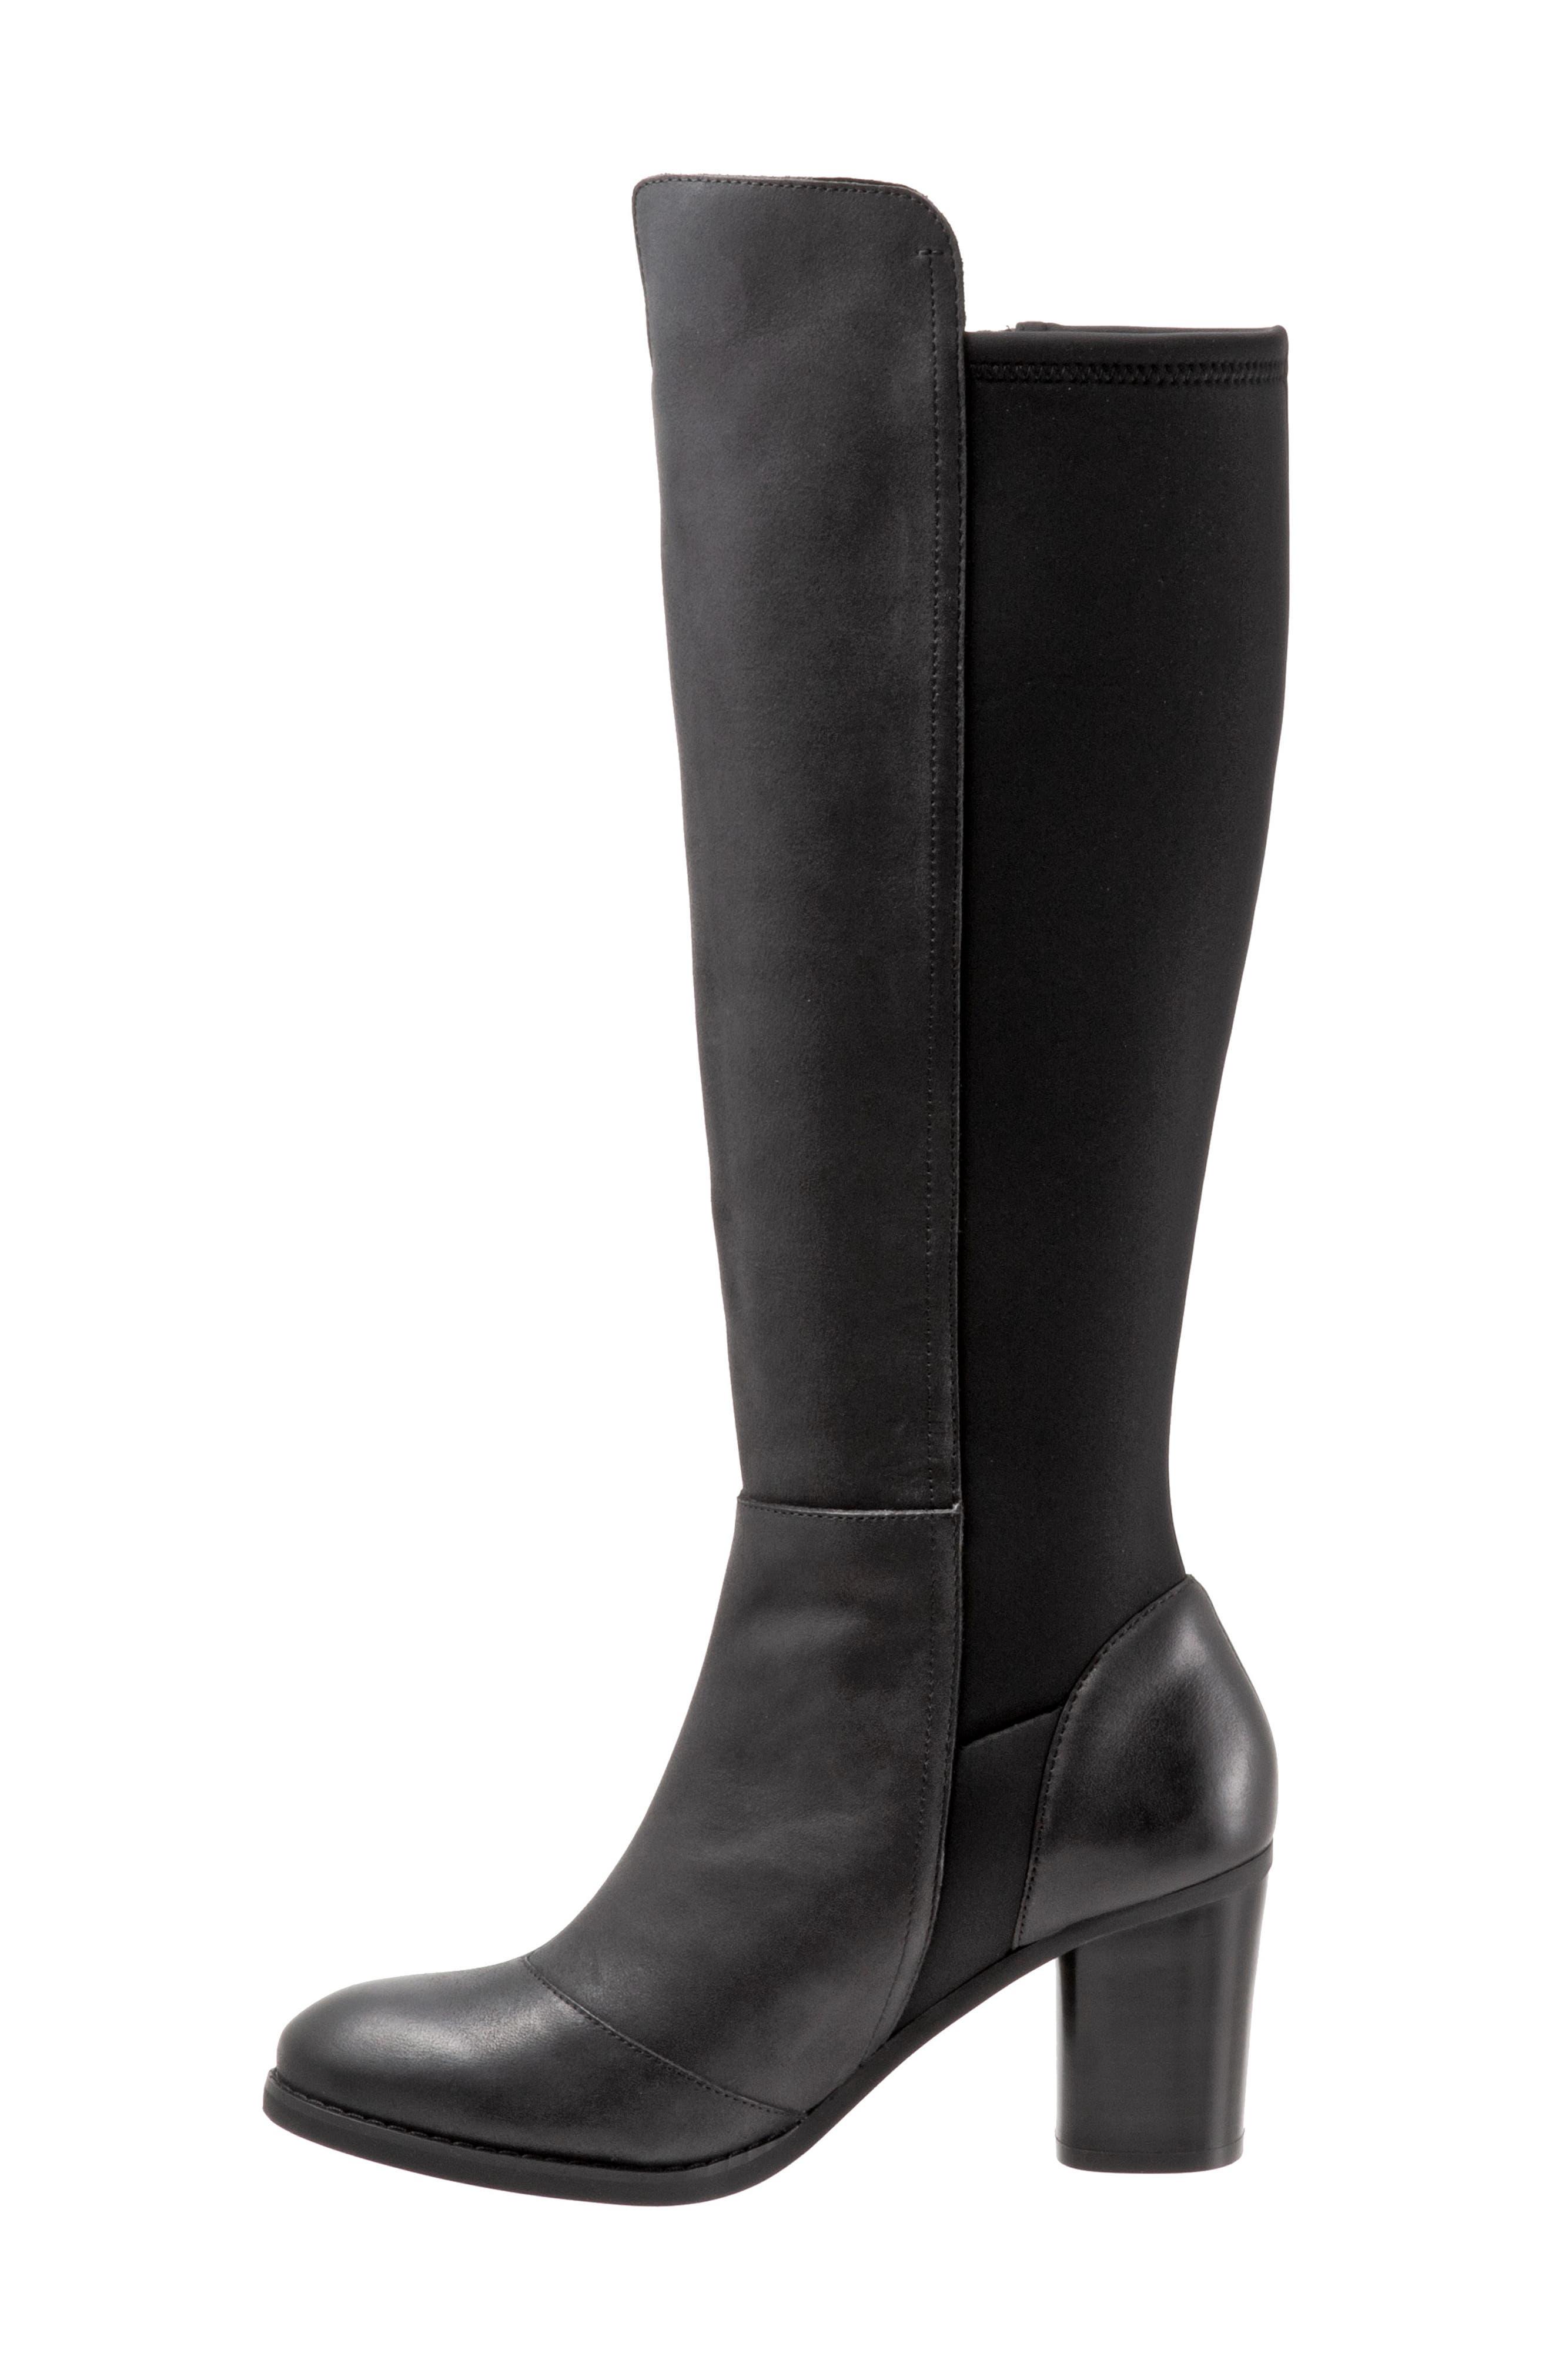 Katia Knee High Boot,                             Alternate thumbnail 8, color,                             BLACK LEATHER